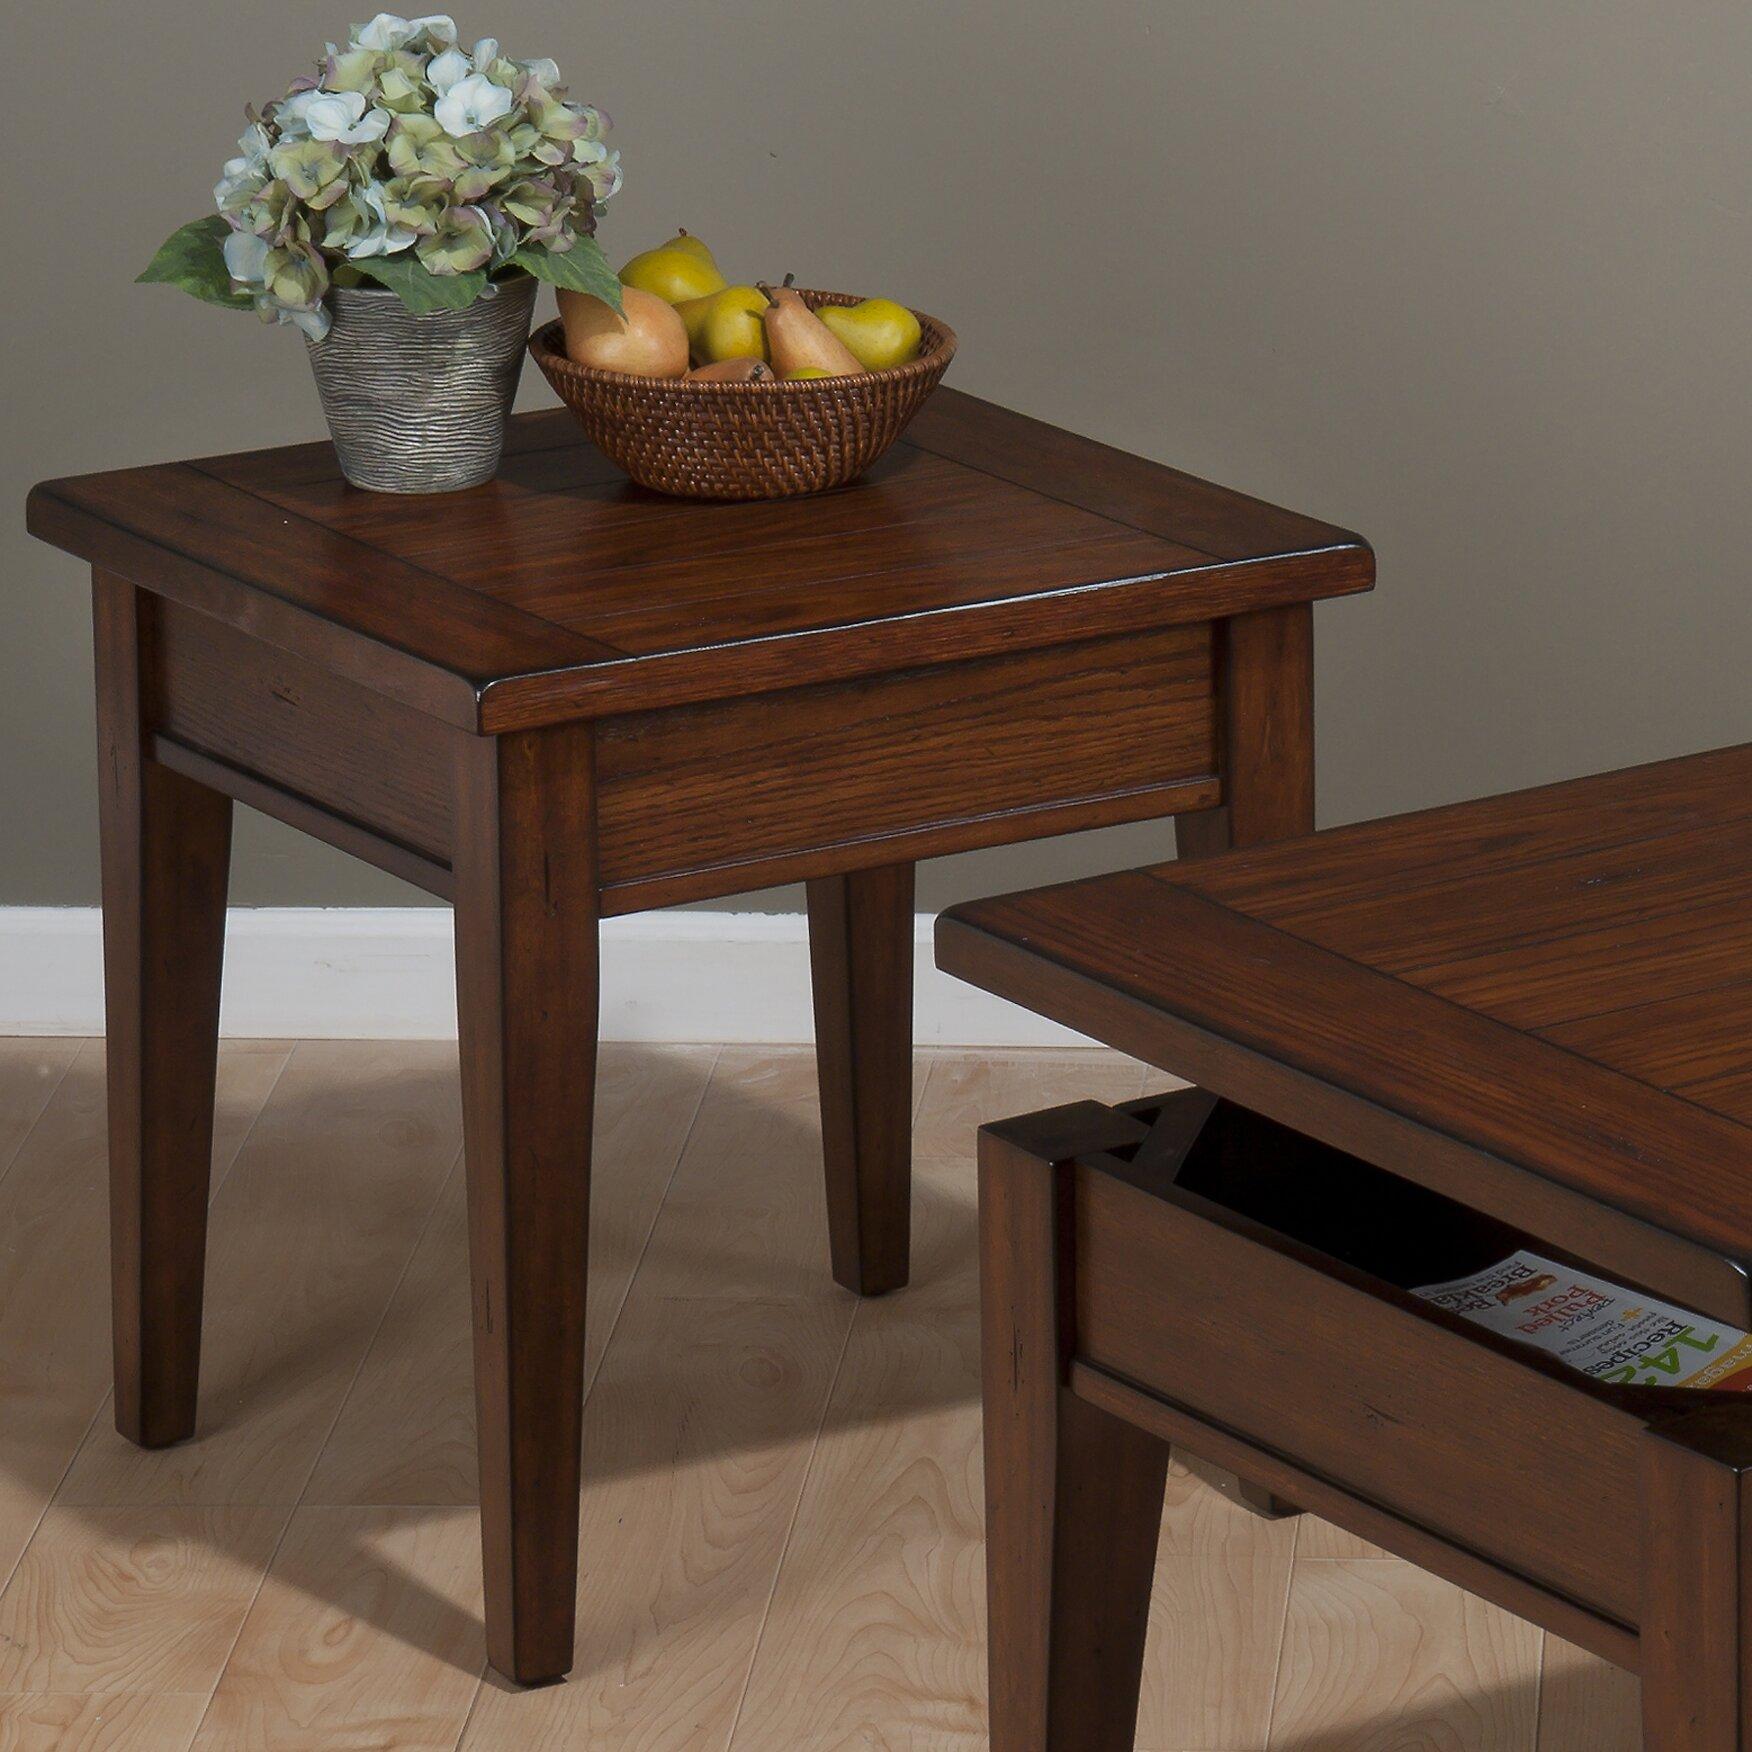 Dunbar Coffee Table by Willa Arlo Interiors Best Buy.